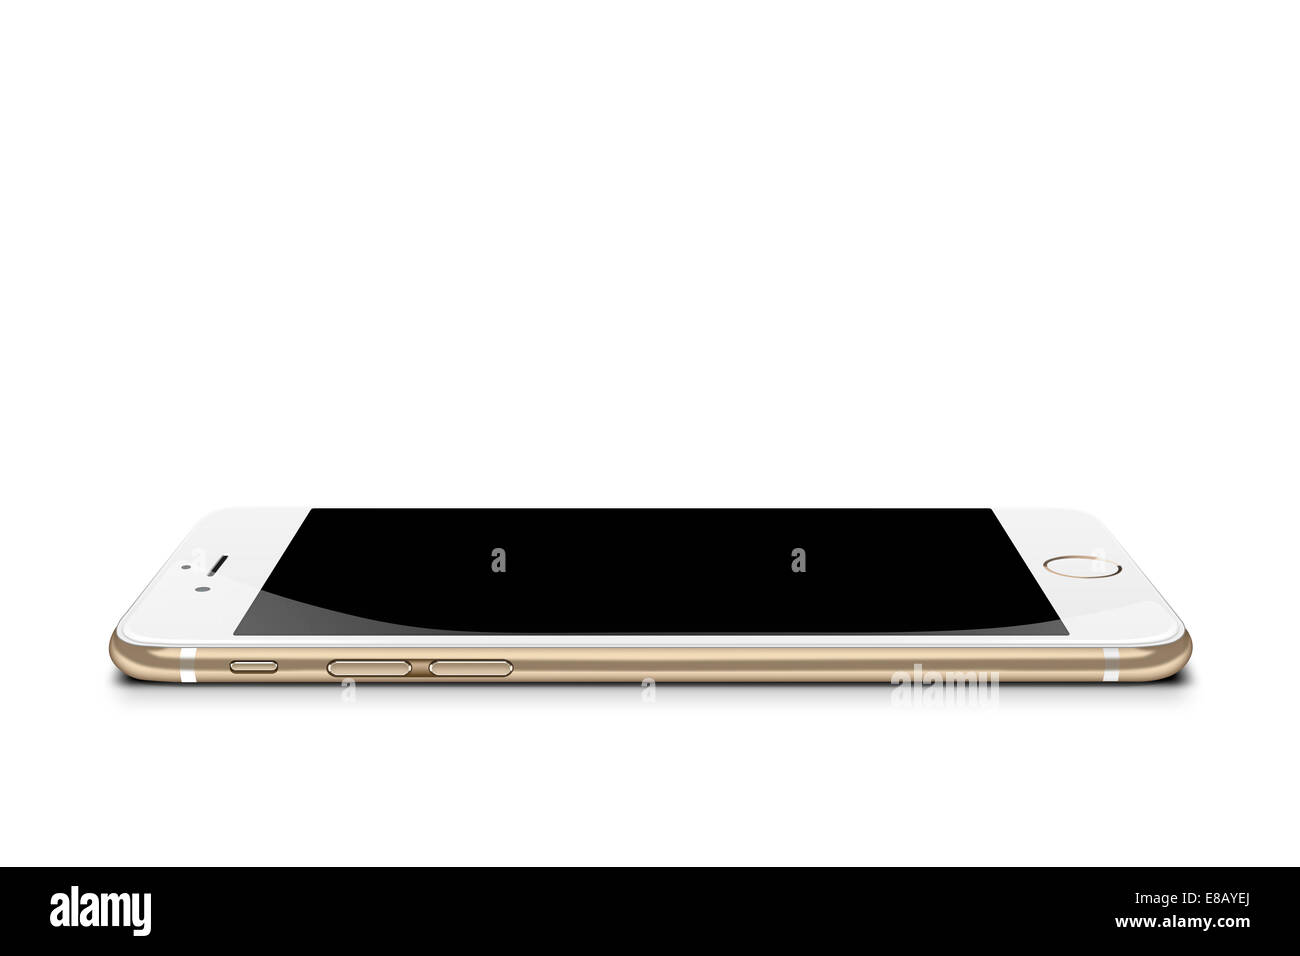 Smartphone iphone 6 gold, digitally generated artwork. - Stock Image